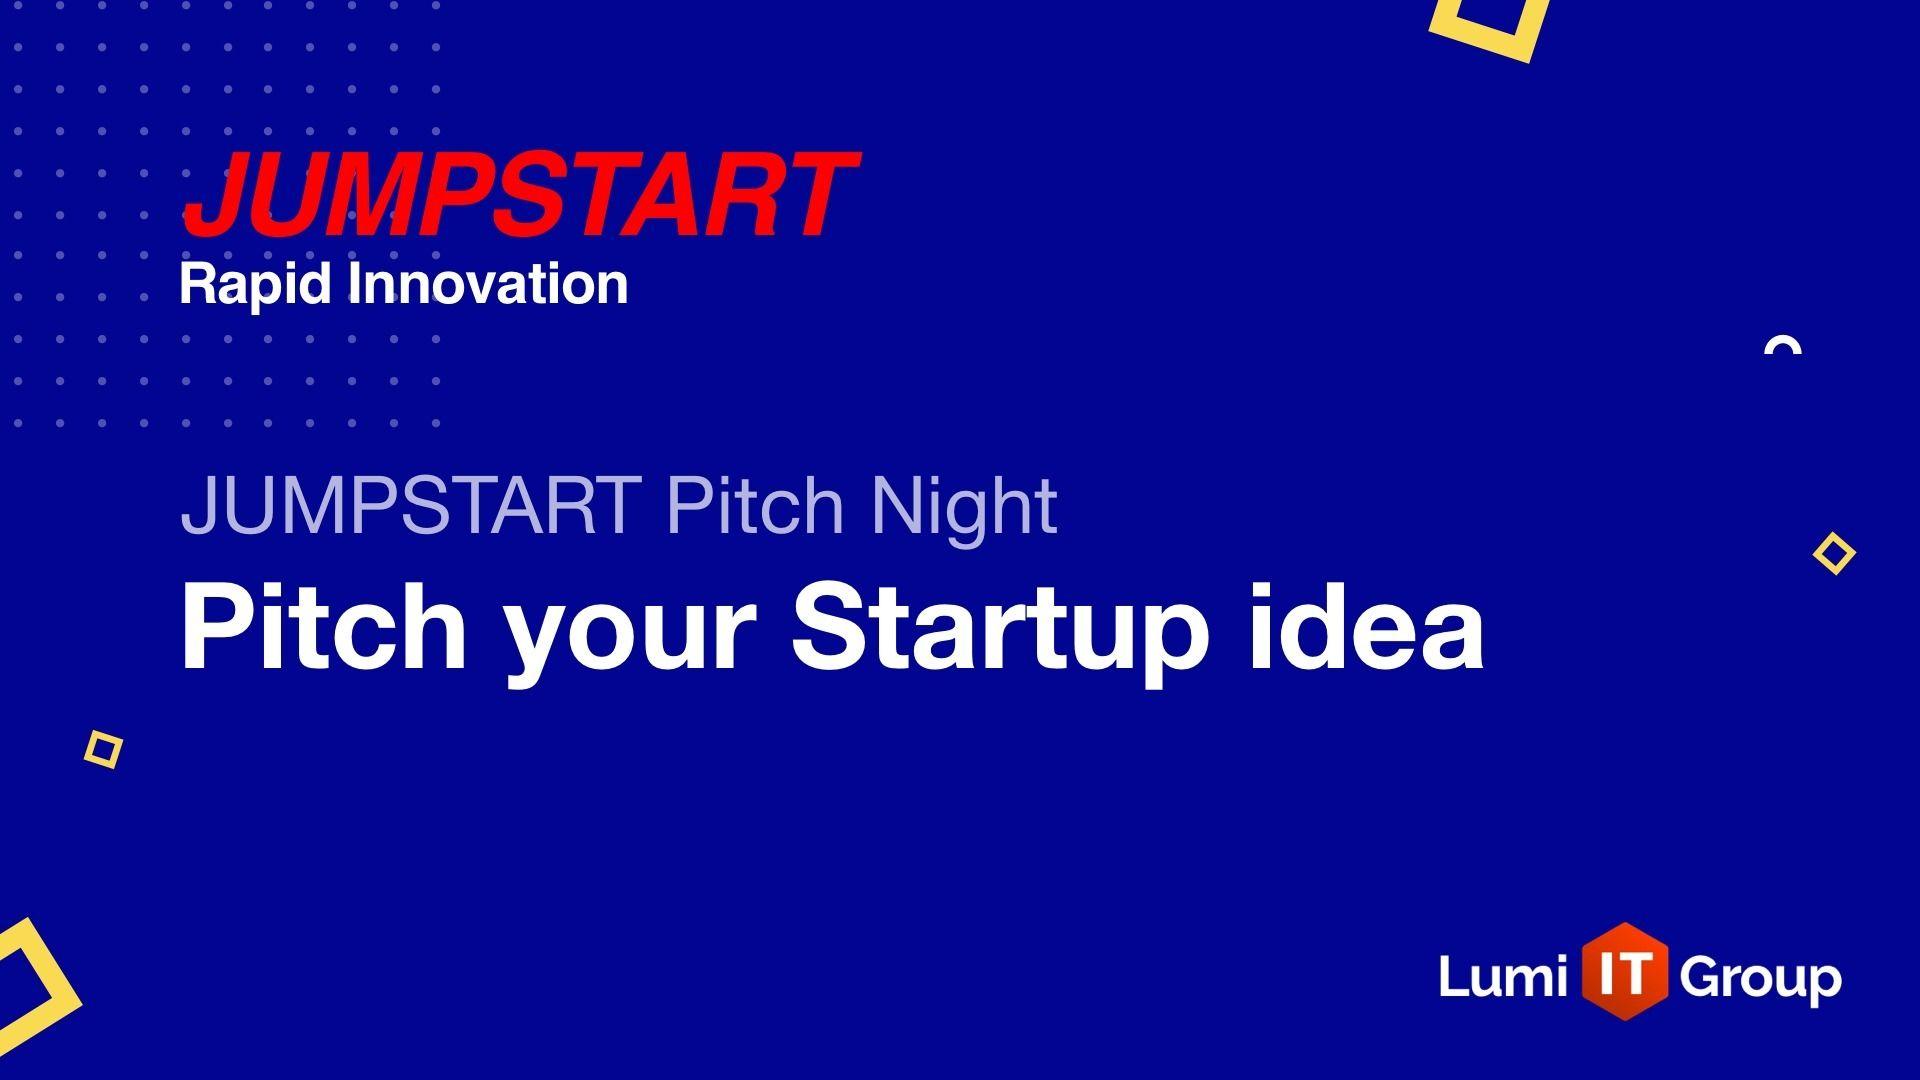 JUMPSTART: Rapid Innovation | Founders, Startups, Investors